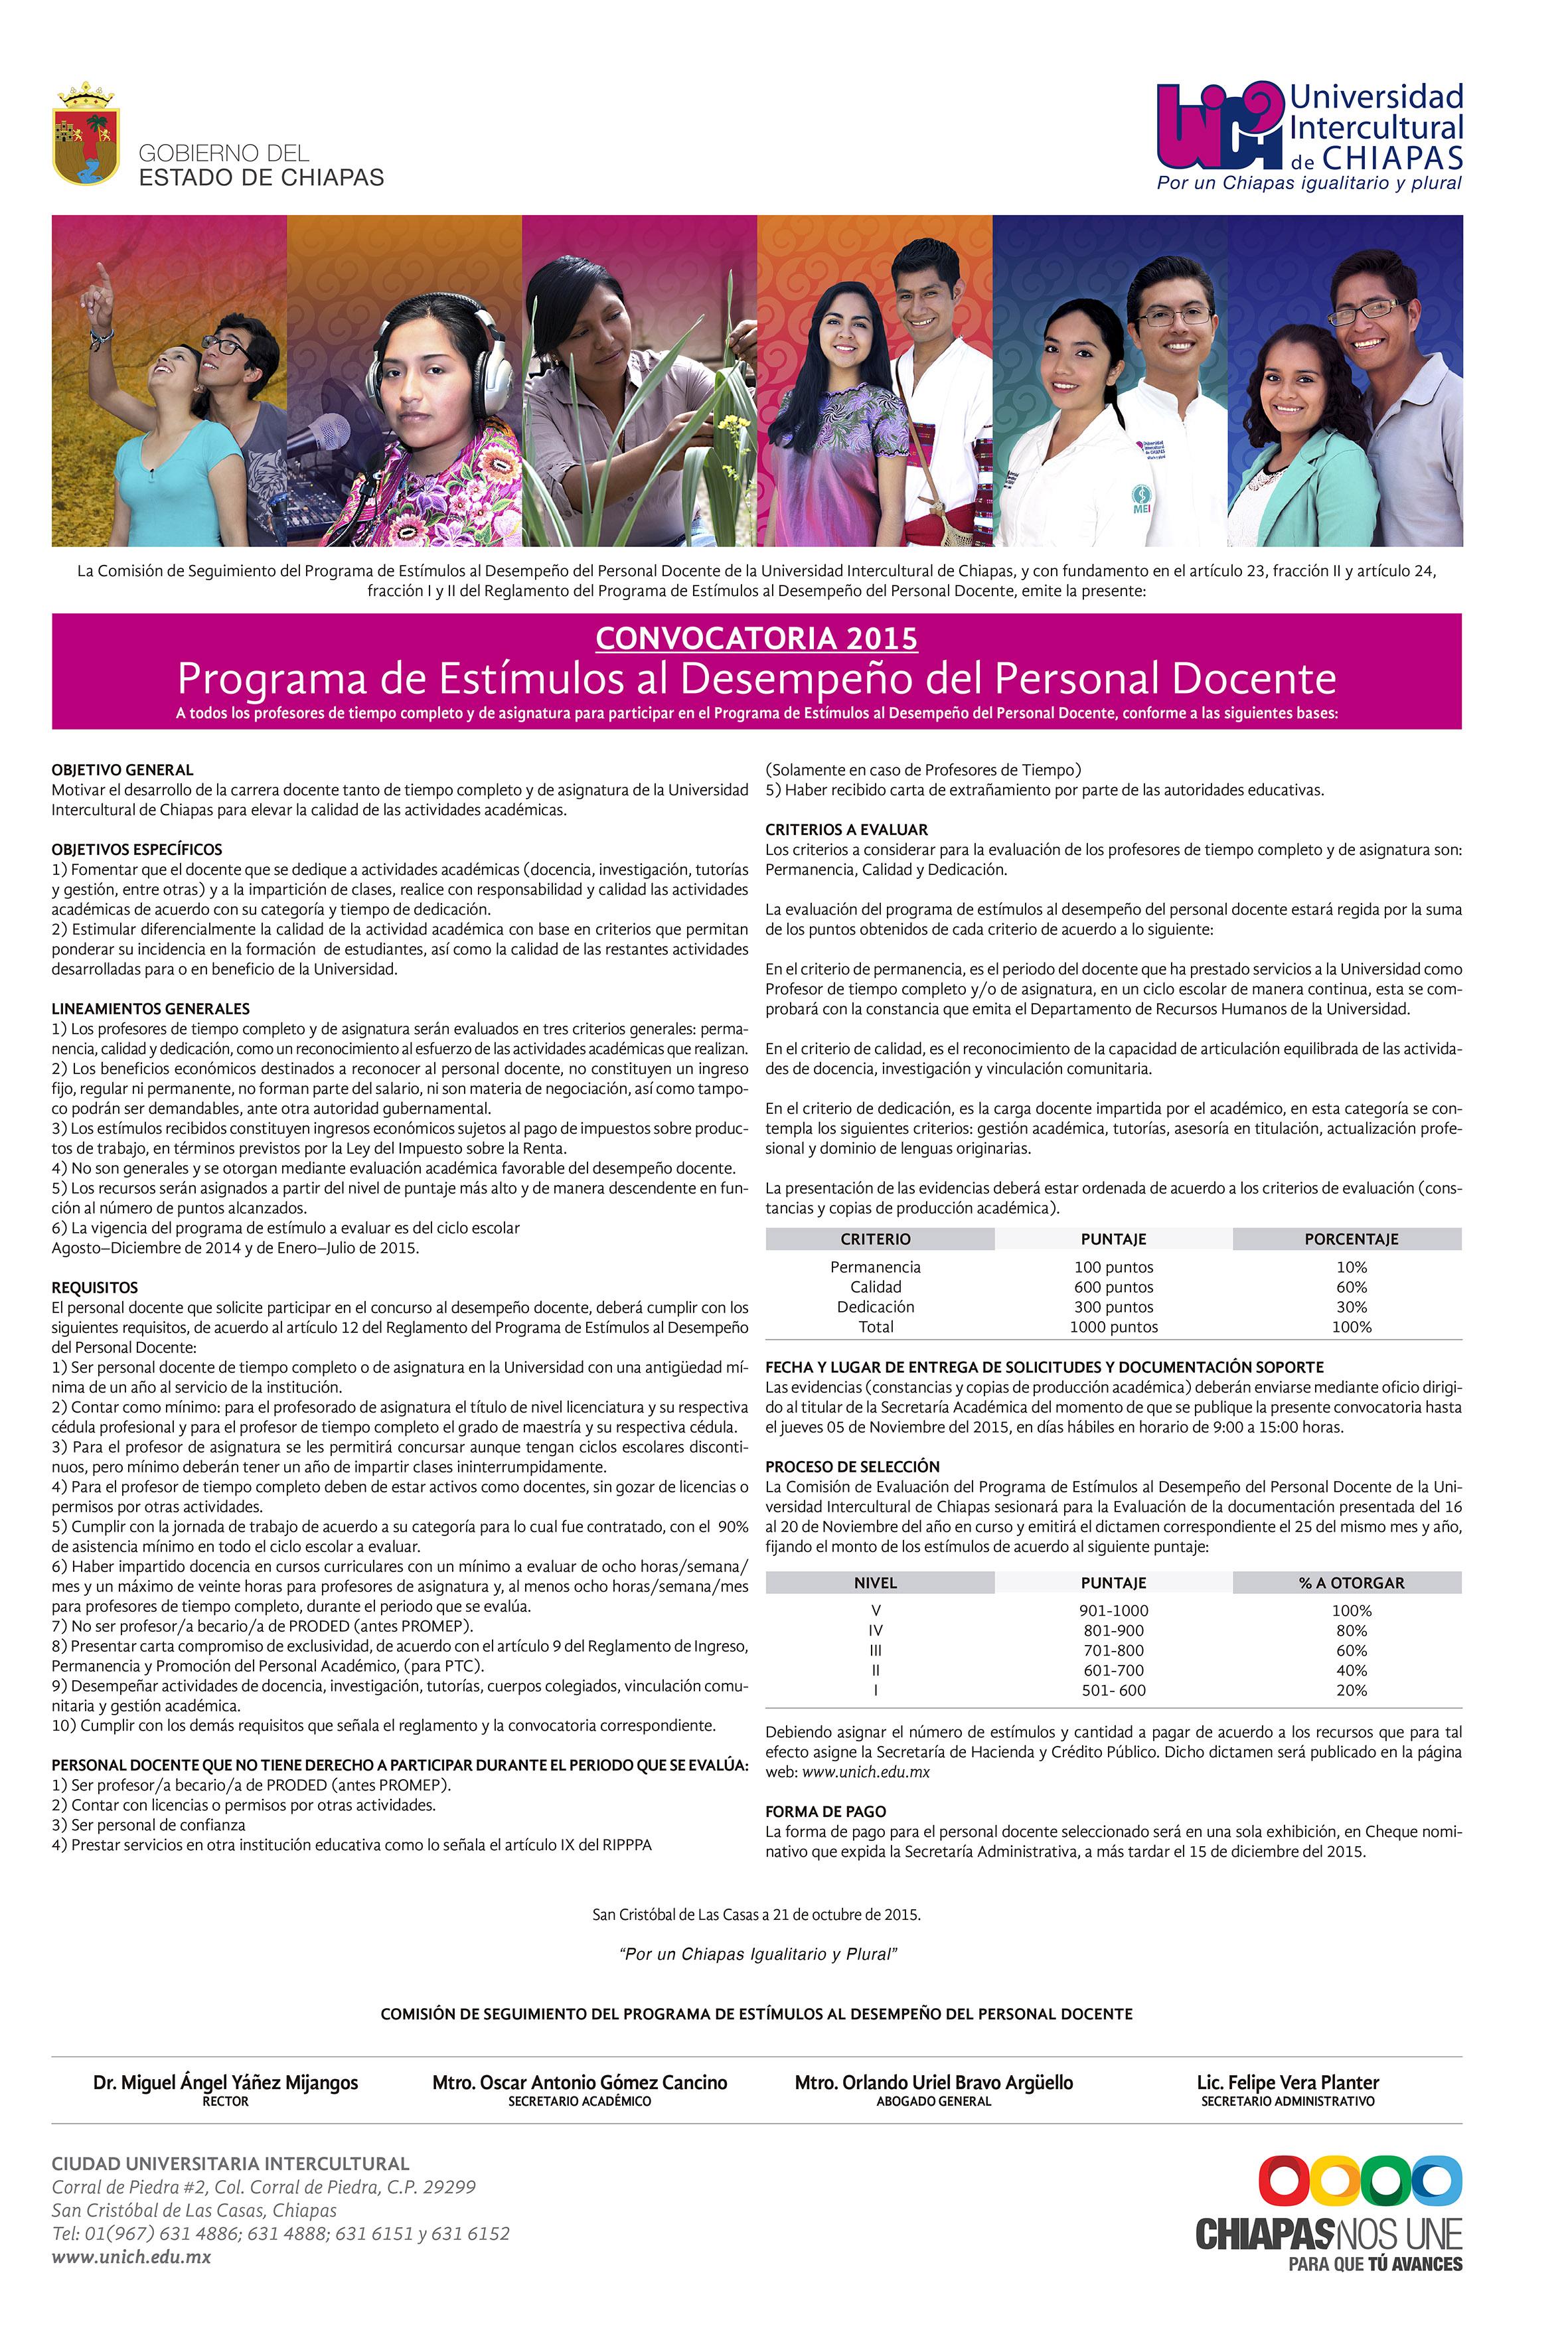 Convocatoria de programa de est mulos al desempe o del for Convocatoria docente